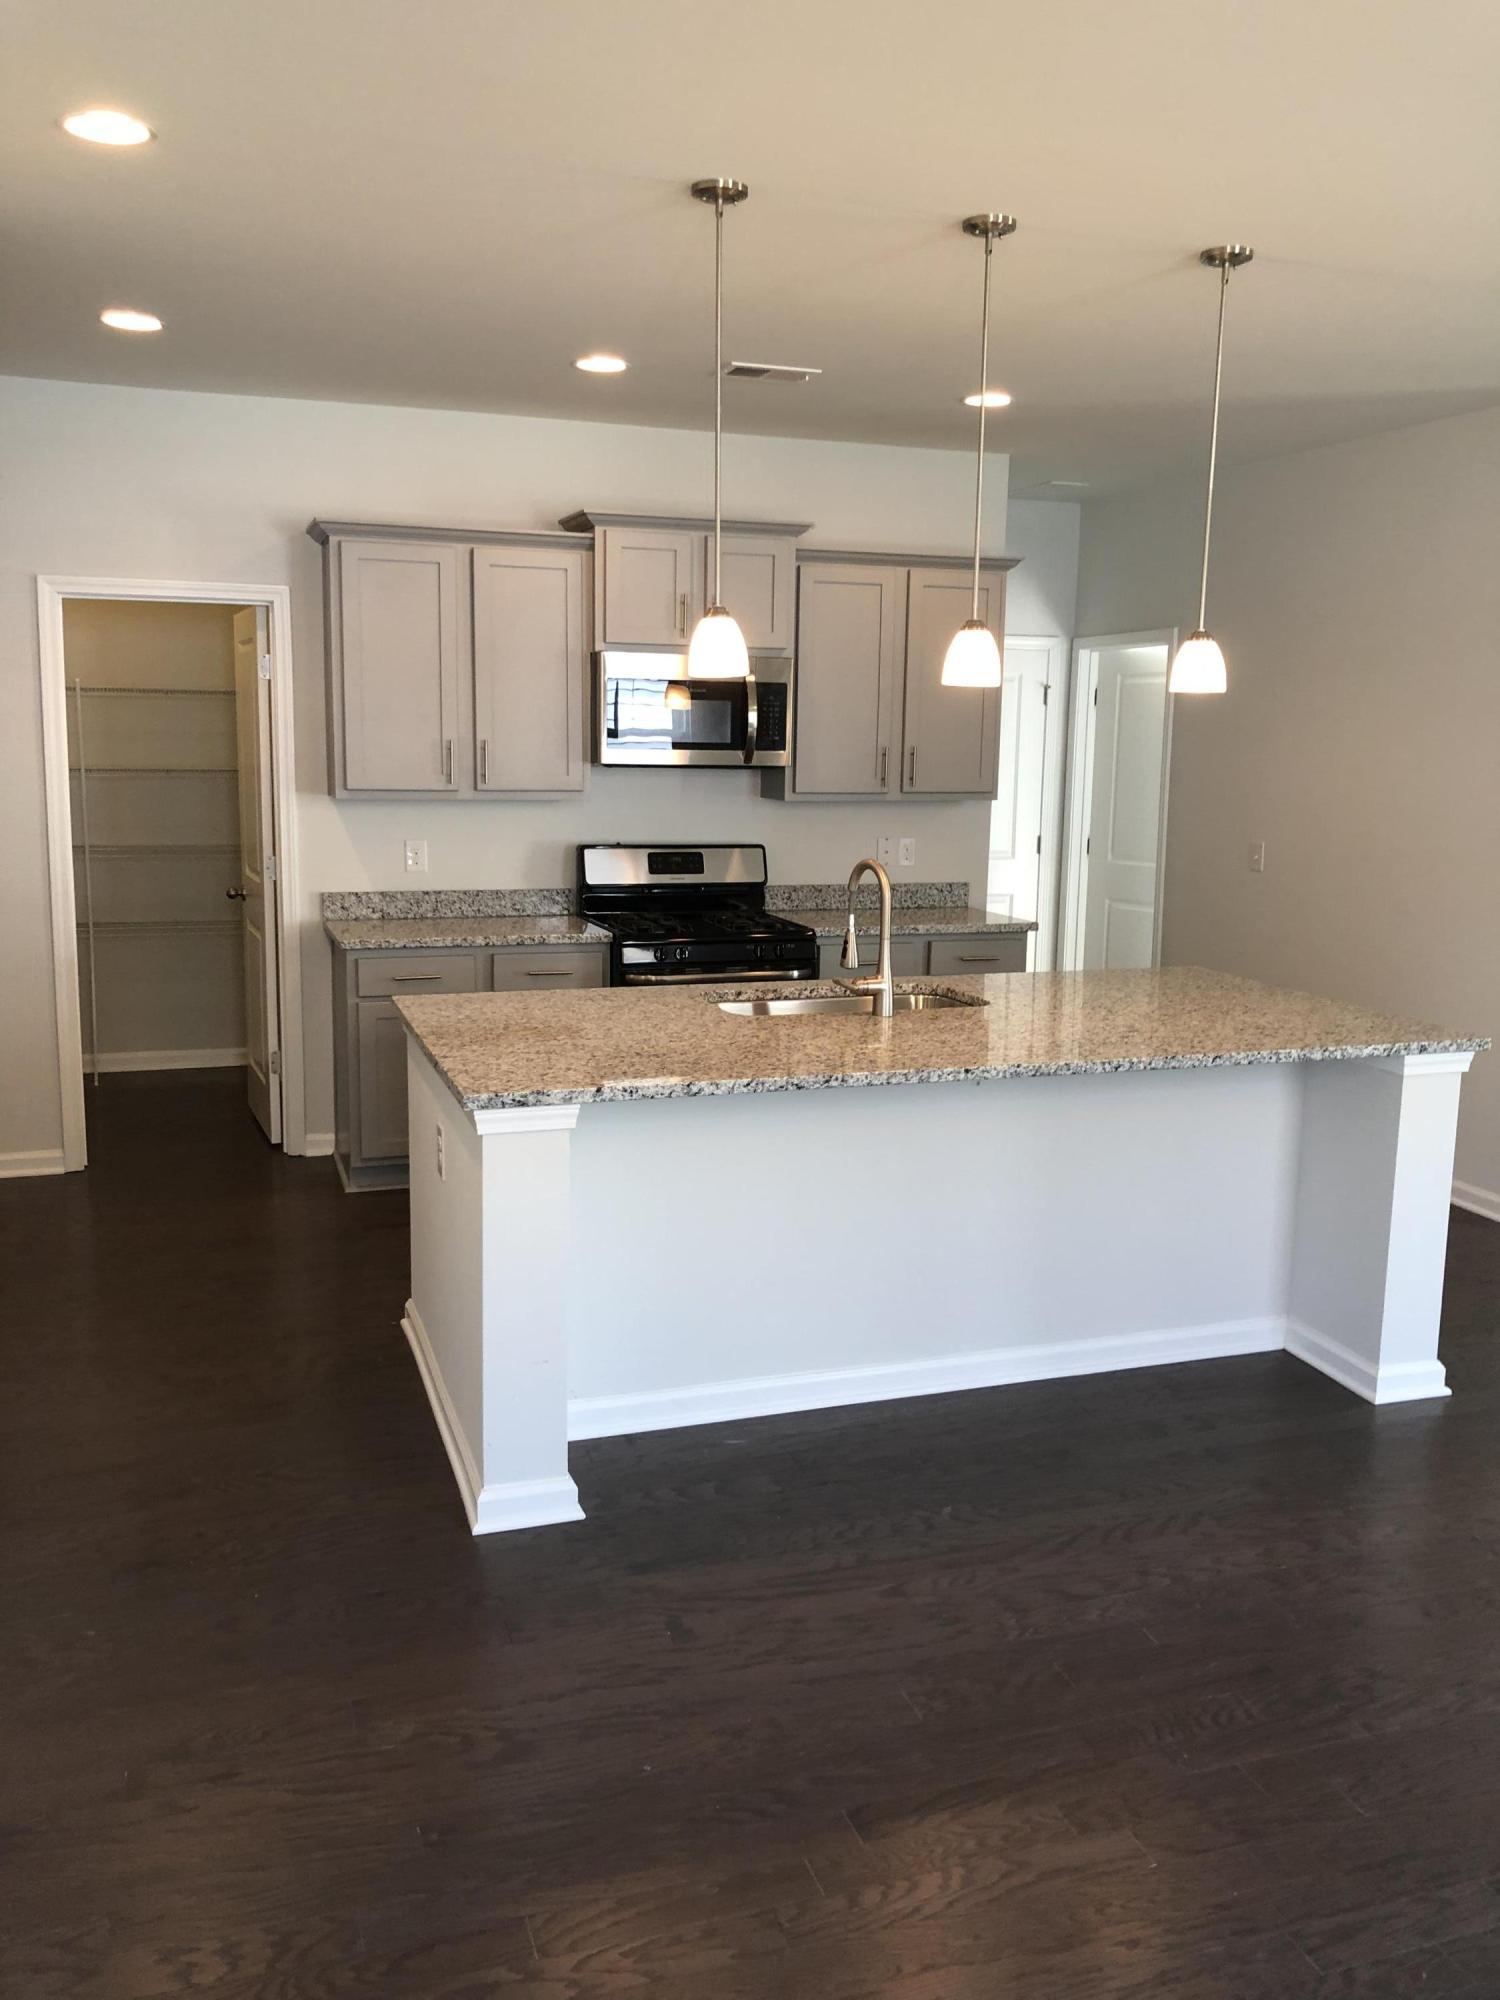 Cane Bay Plantation Homes For Sale - 454 Zenith, Summerville, SC - 11